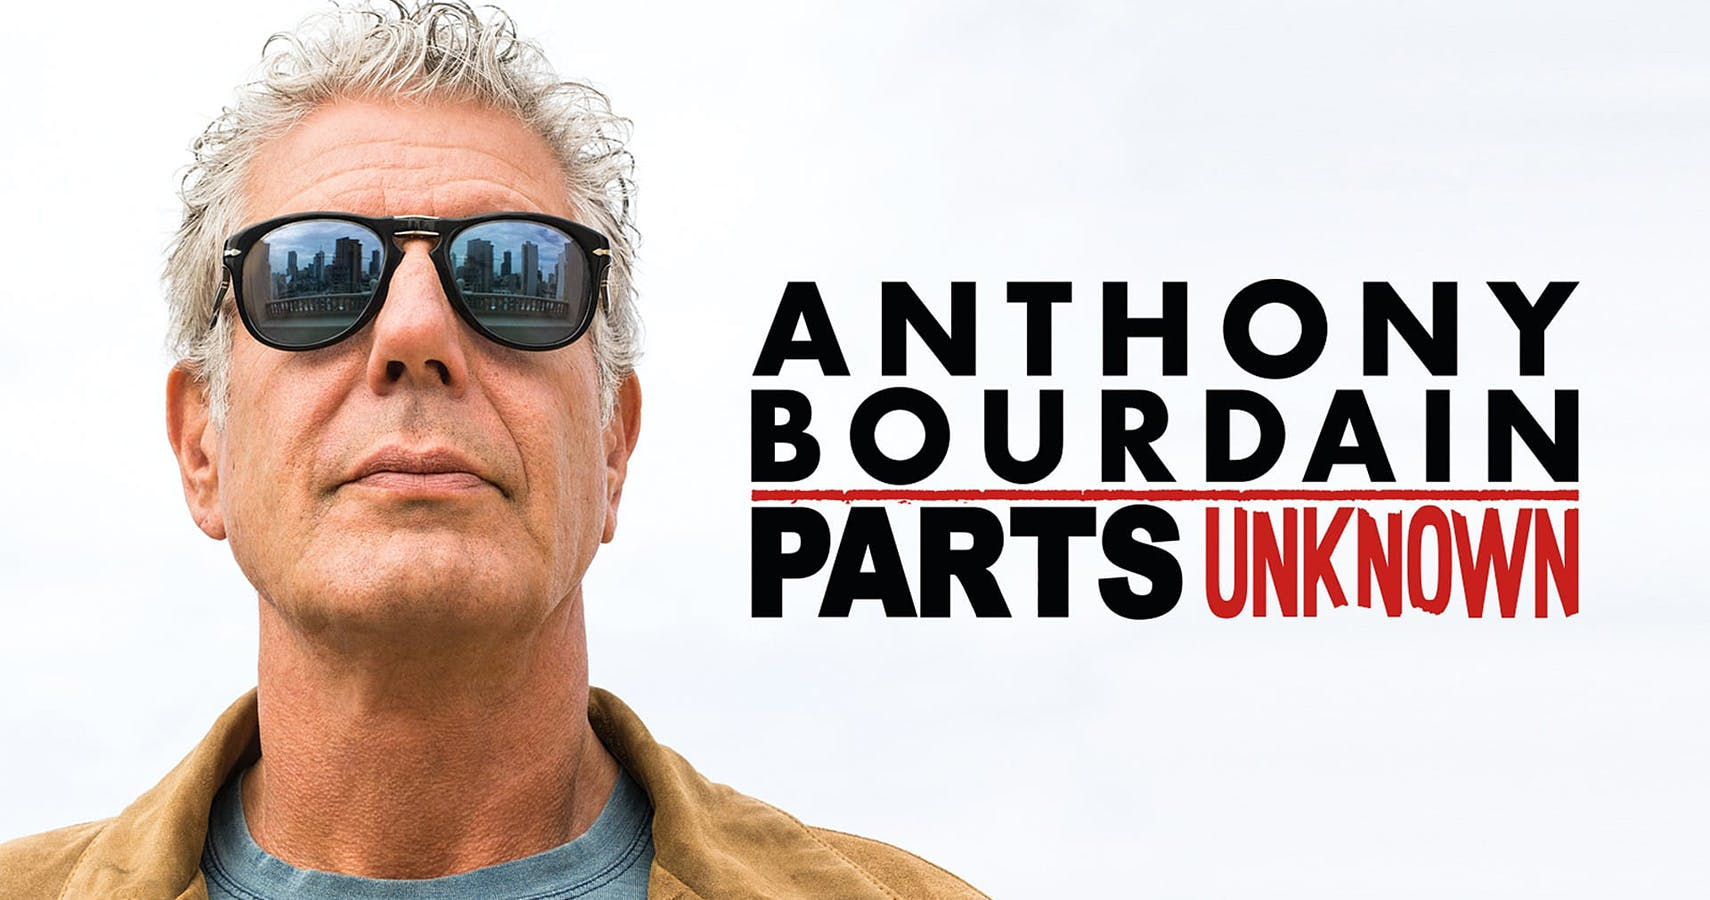 Anthony-Bourdain-Parts-Unknown-key-art.jpg